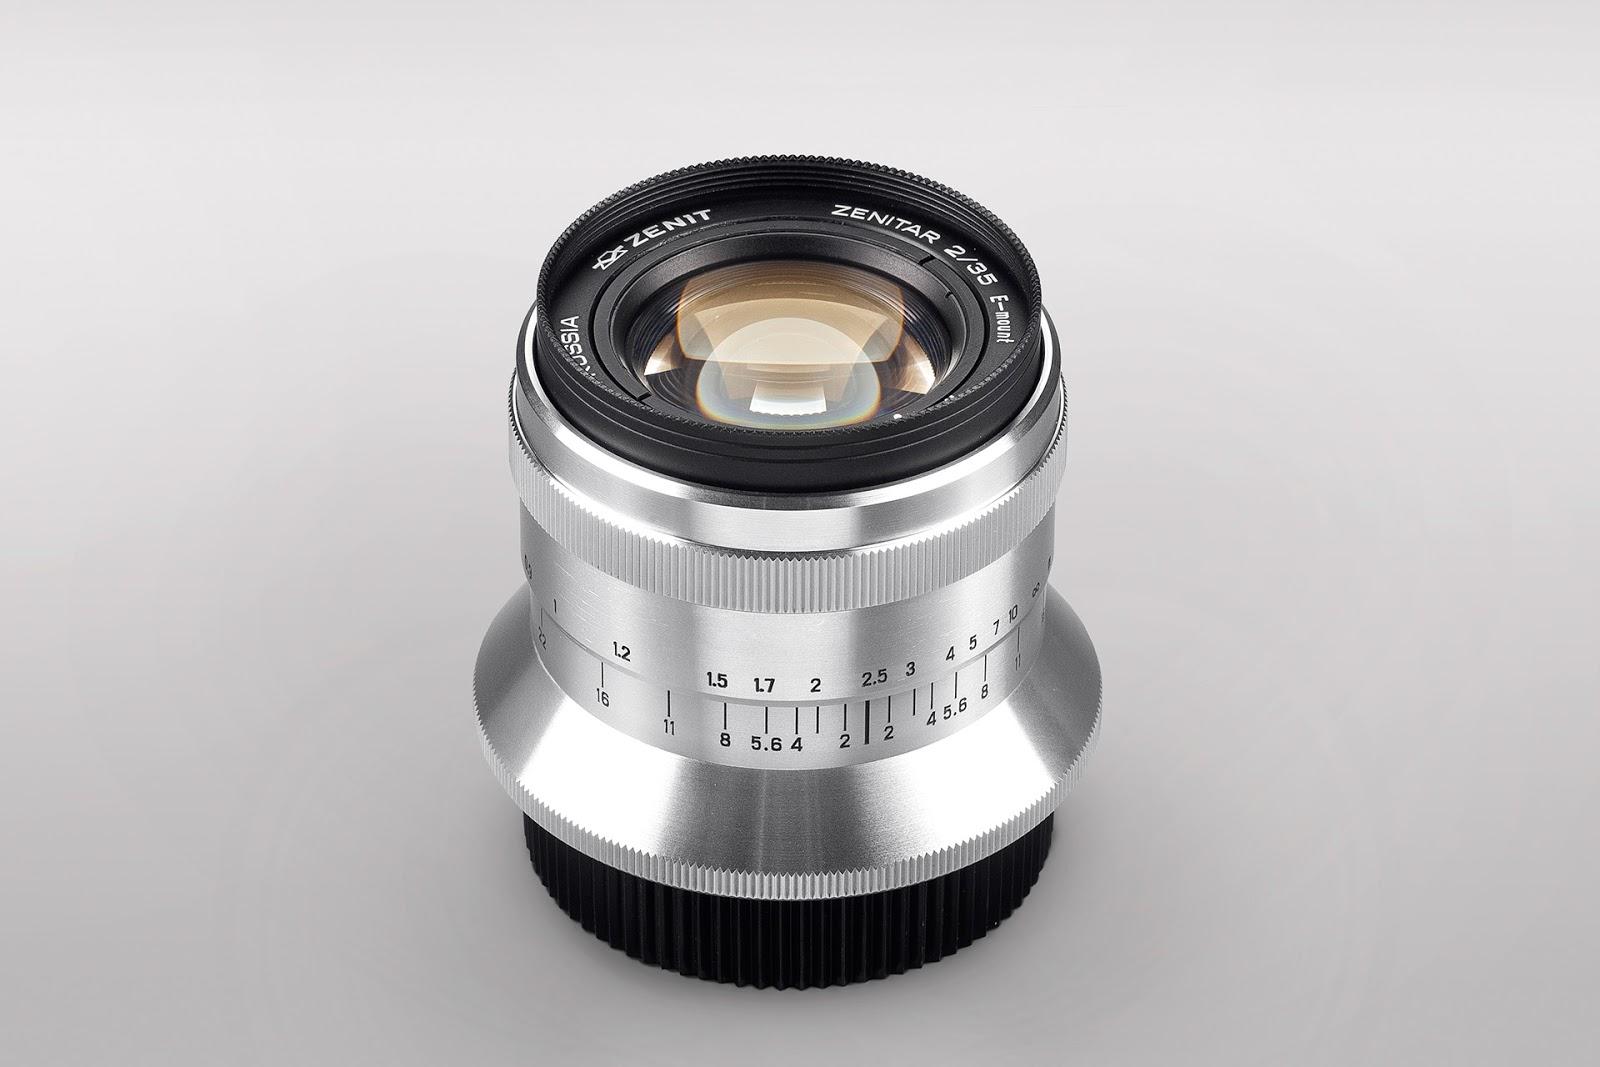 Zenitar 35mm f/2.0